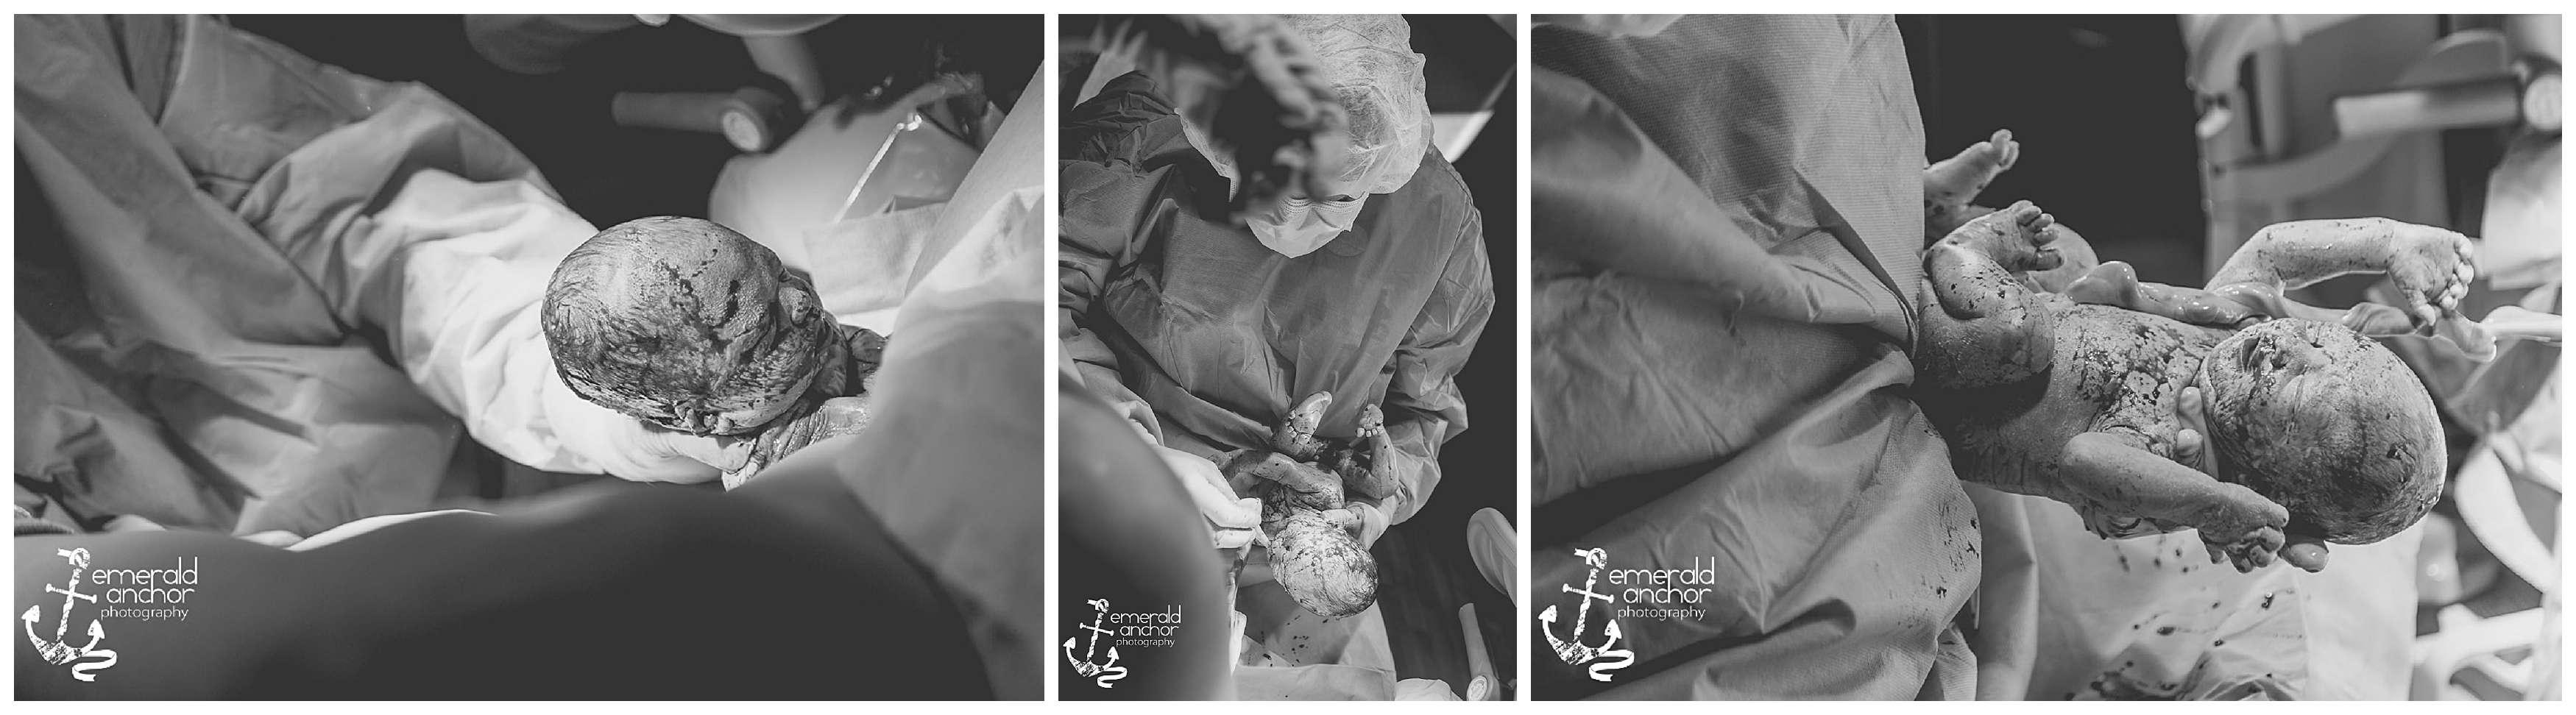 Emerald Anchor Photography Riverside Hospital Birth Story Photography Uriah Kade (56)